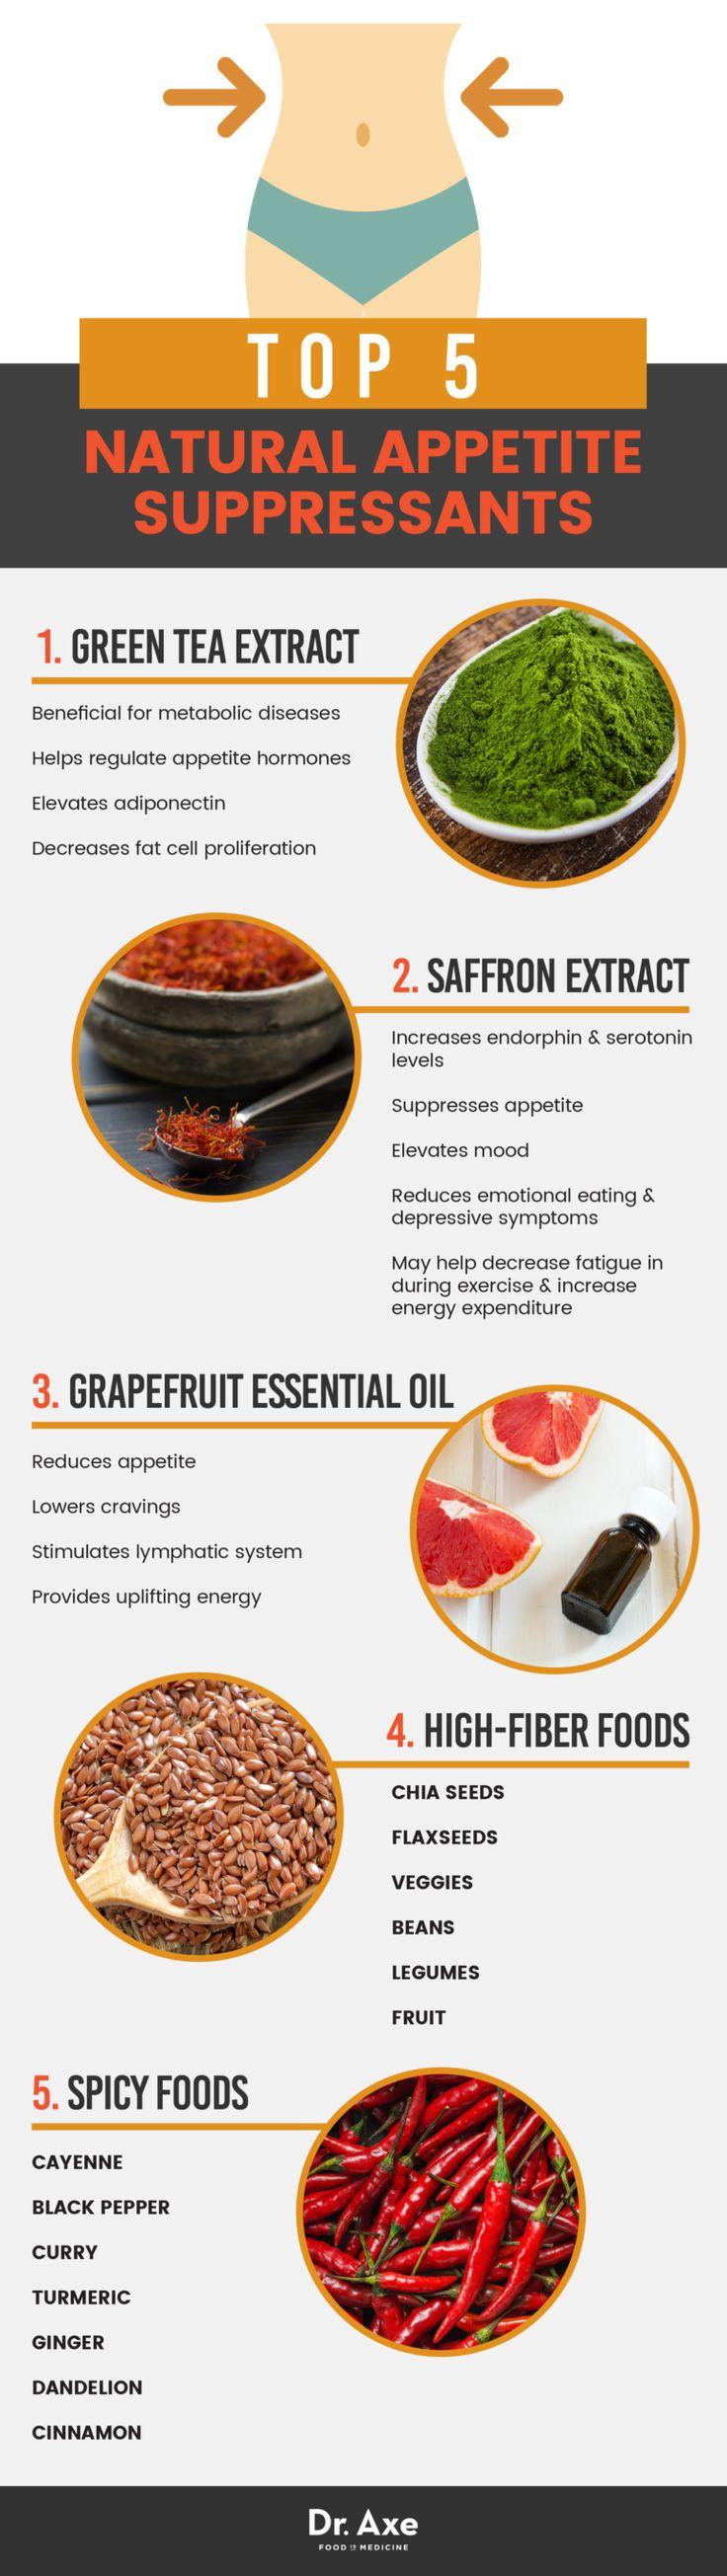 Top five natural appetite suppressants - Dr. Axe